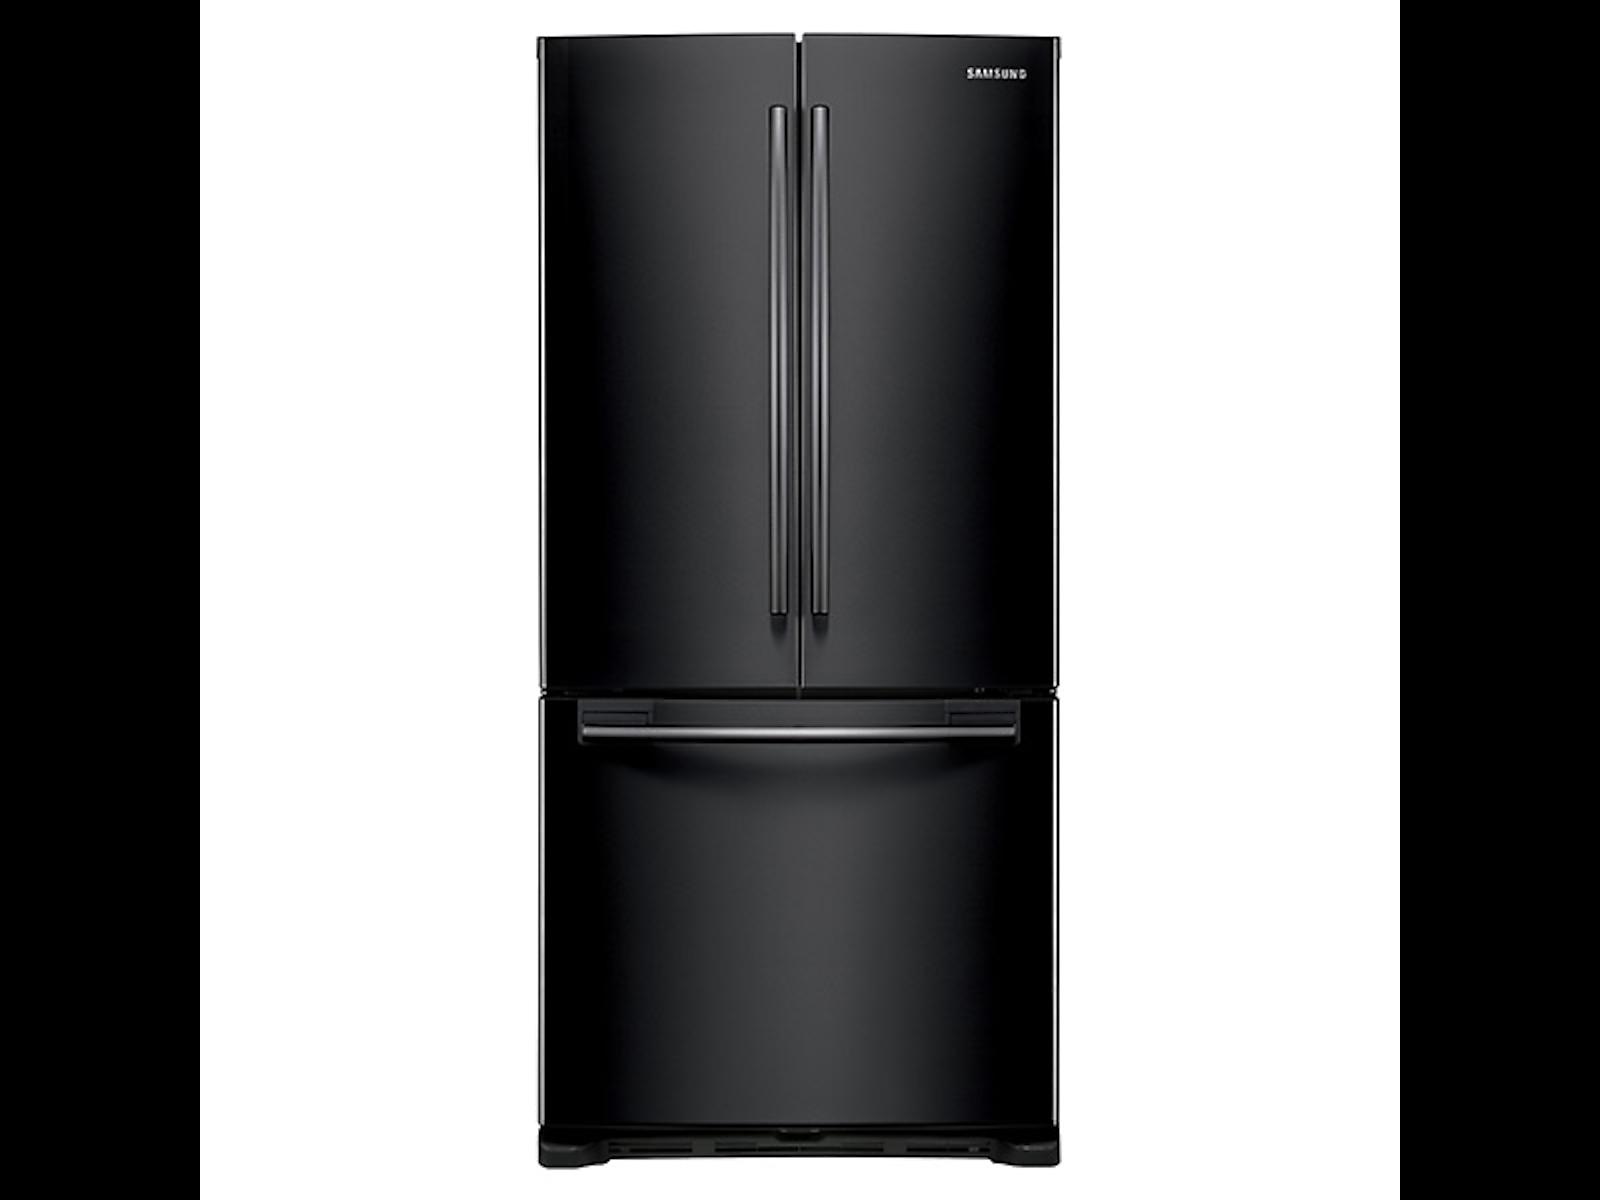 Samsung 20 cu. ft. French Door Refrigerator in Black (RF20HFENBBC/US)